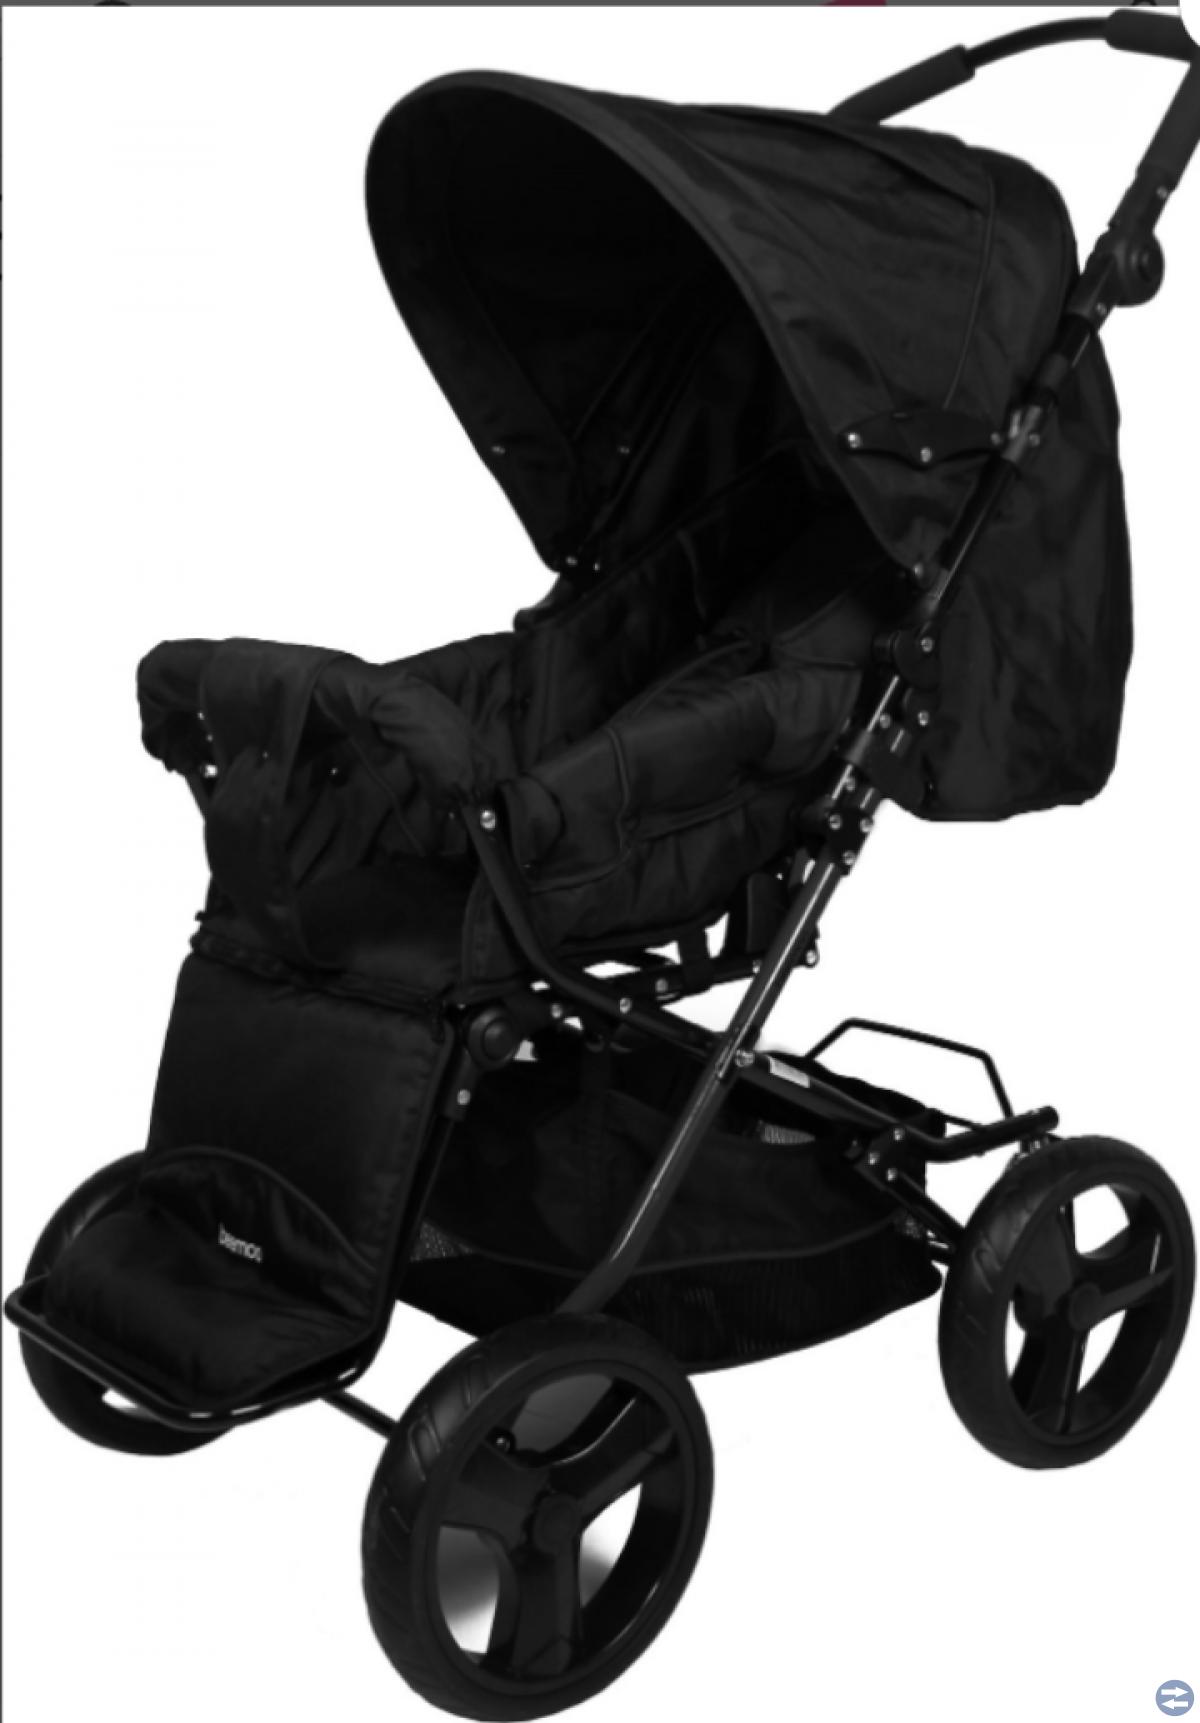 'Ny' barnvagn/sittvagn/sulky.